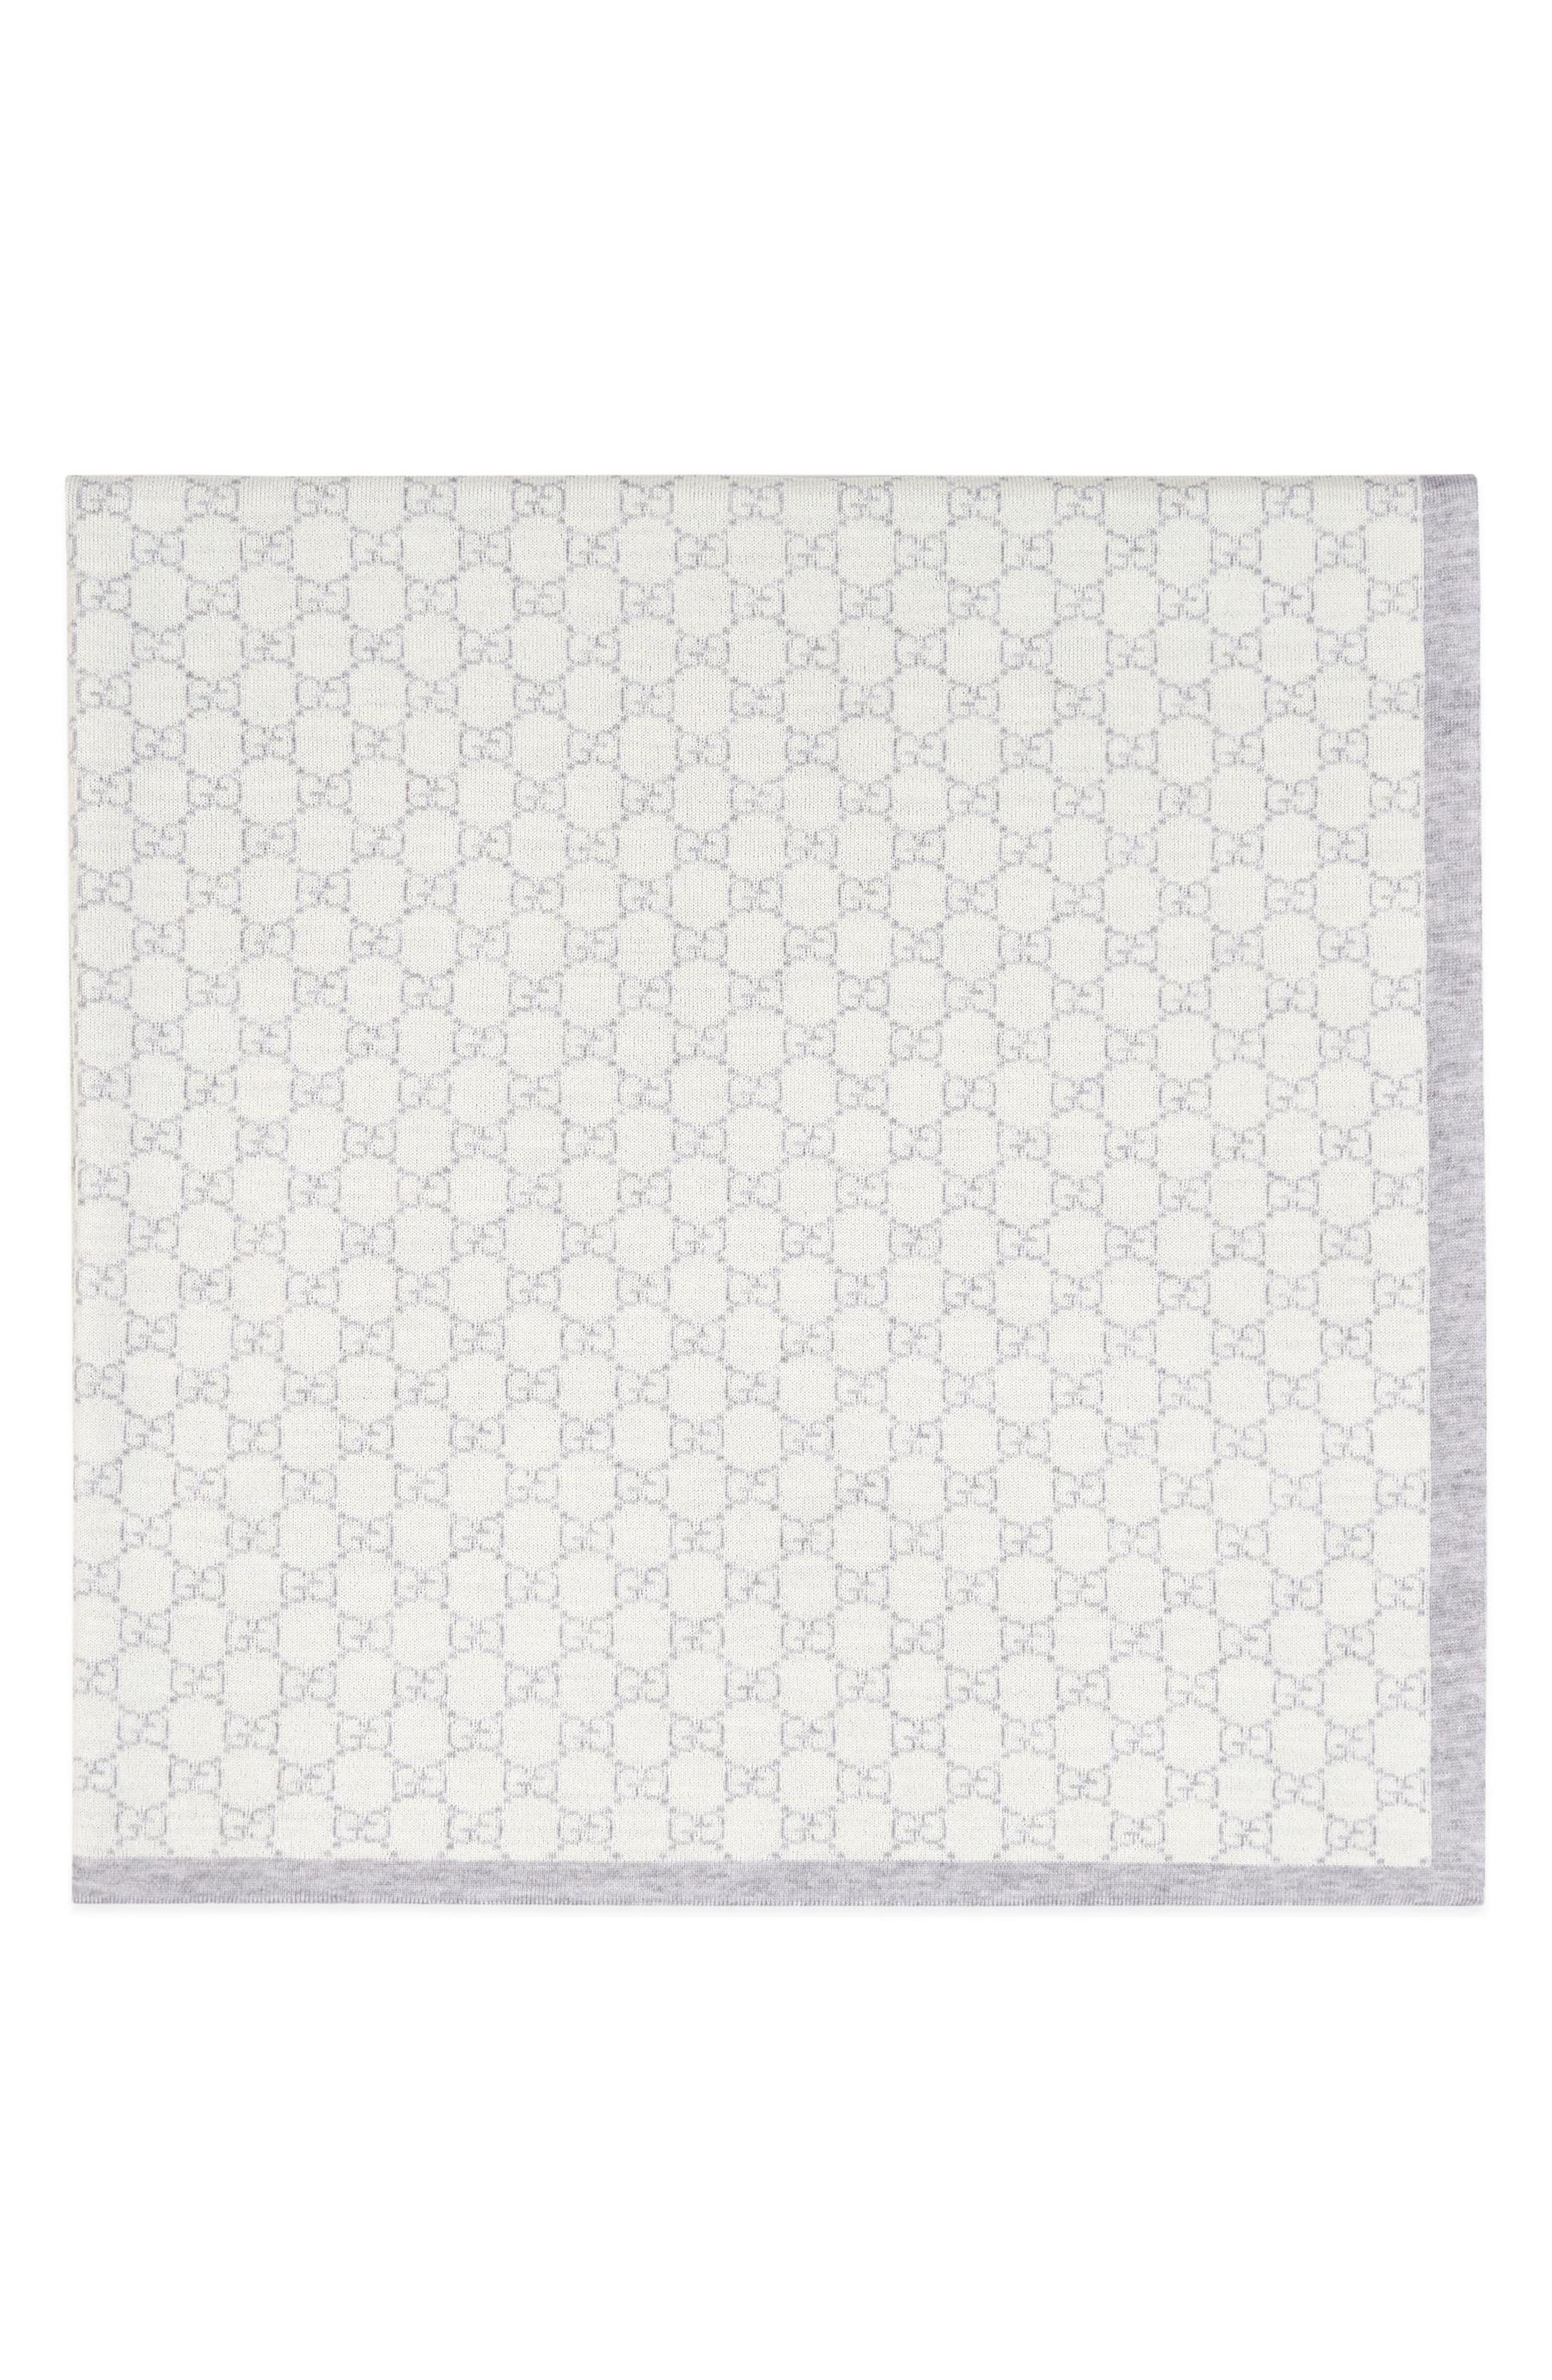 Wool Baby Blanket,                             Alternate thumbnail 6, color,                             IVORY/ SKY BLUE